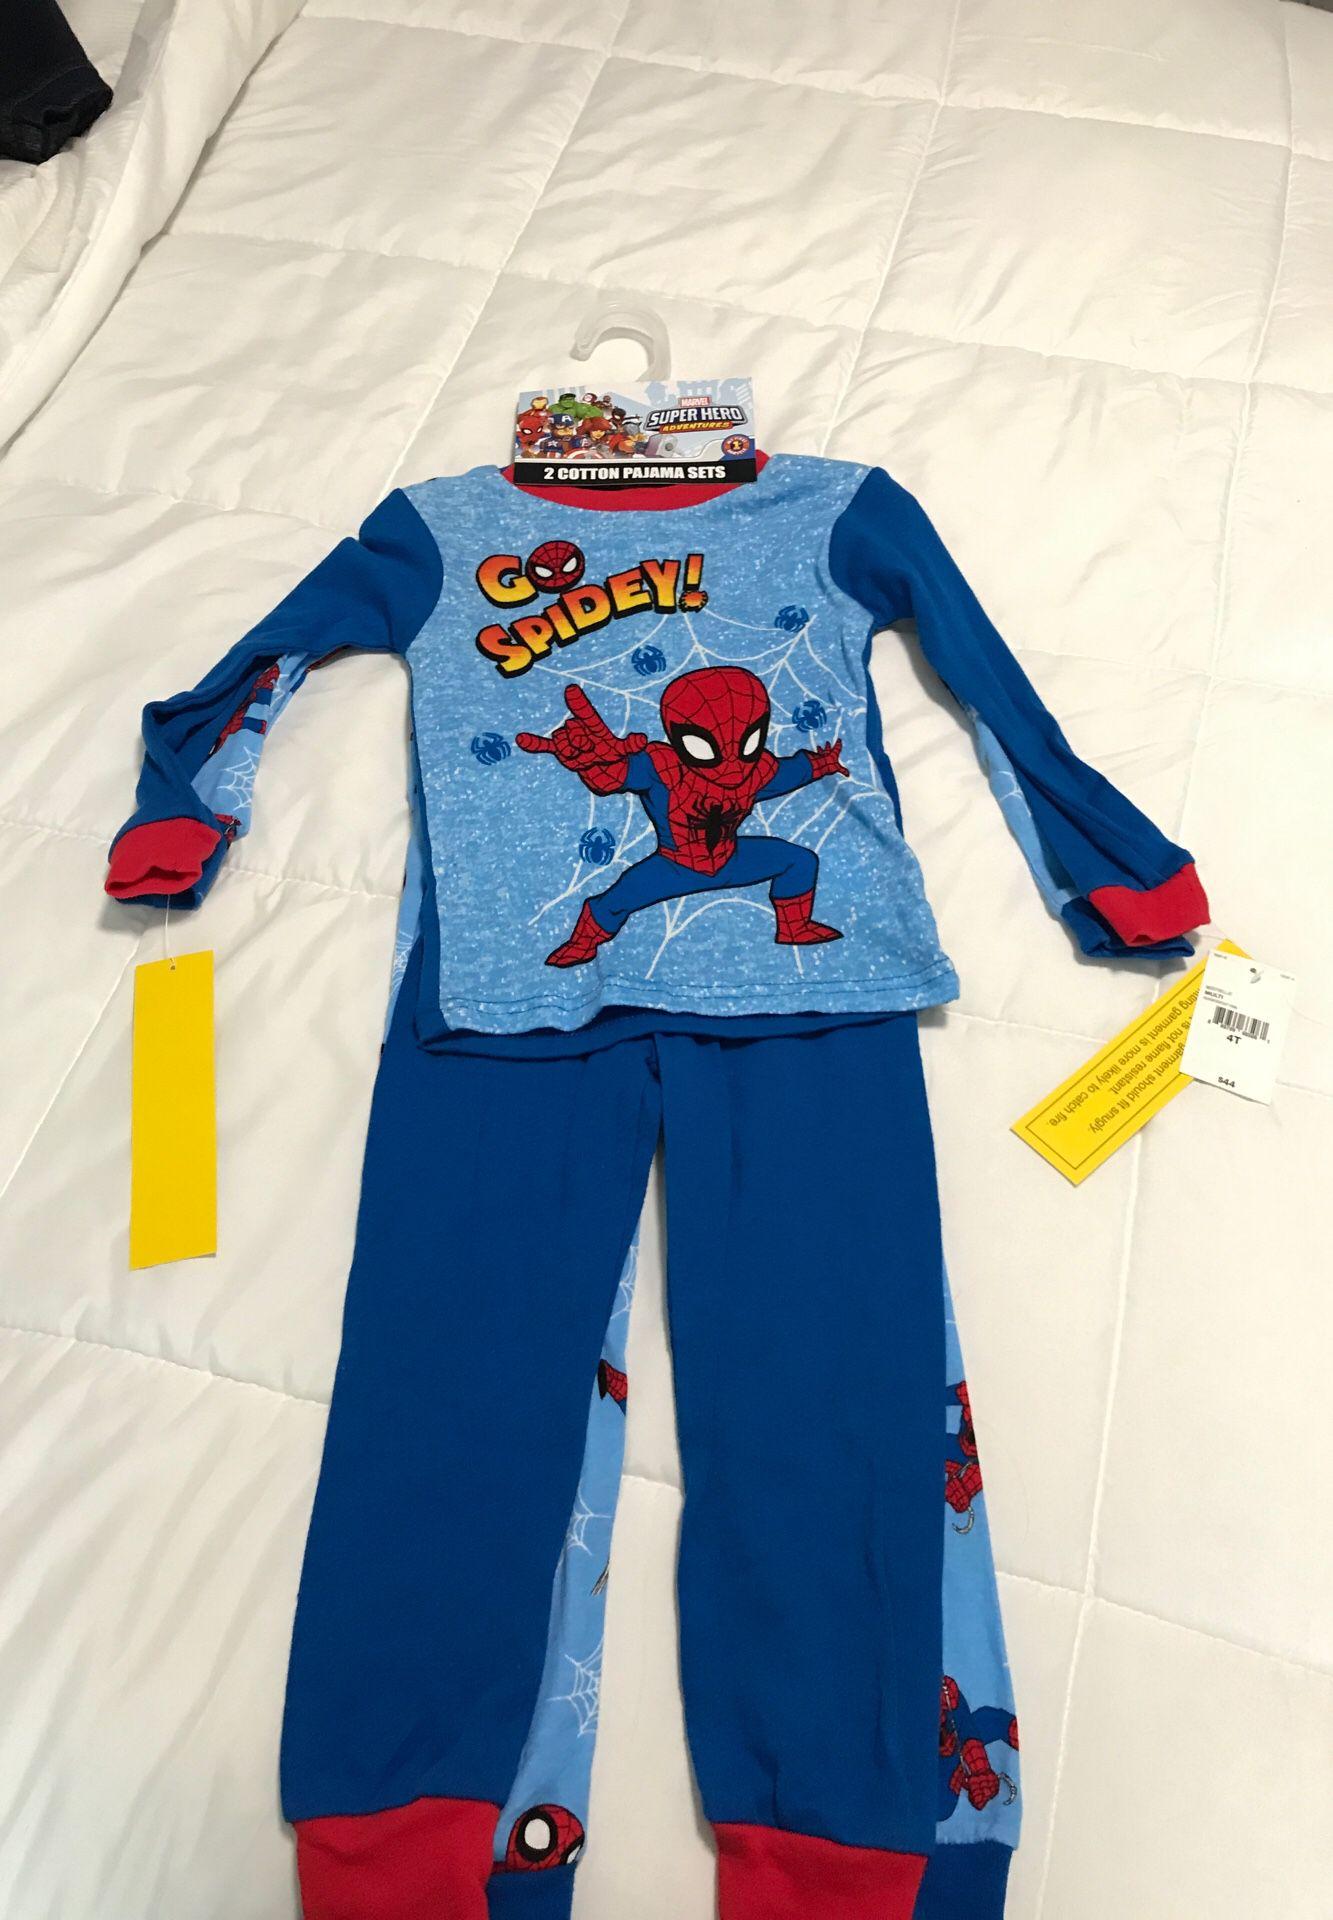 2 Spider-Man pajama sets